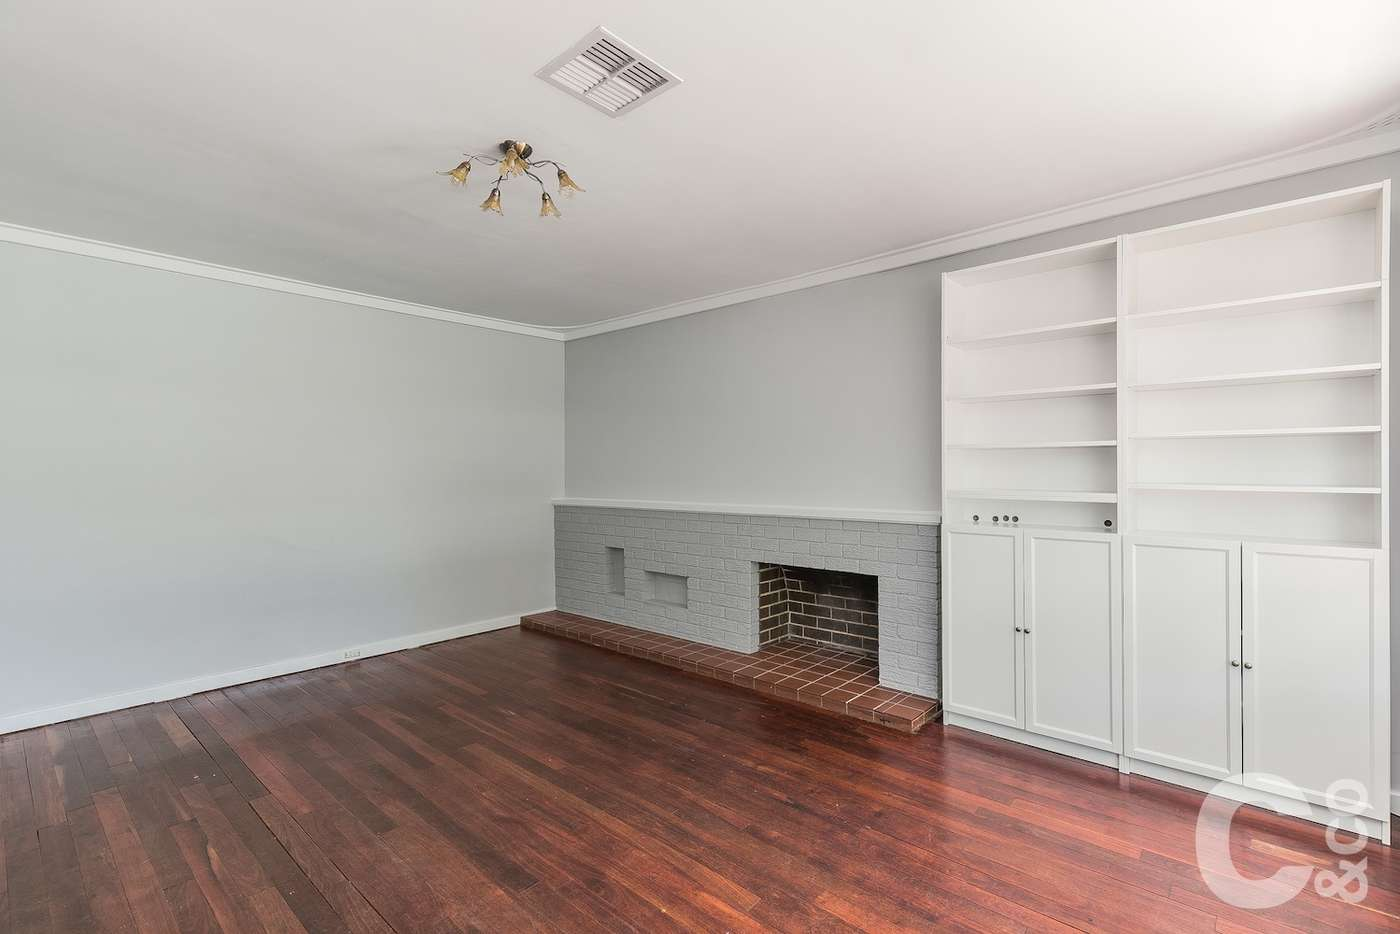 Seventh view of Homely house listing, 60 Christmas Avenue, Orelia WA 6167